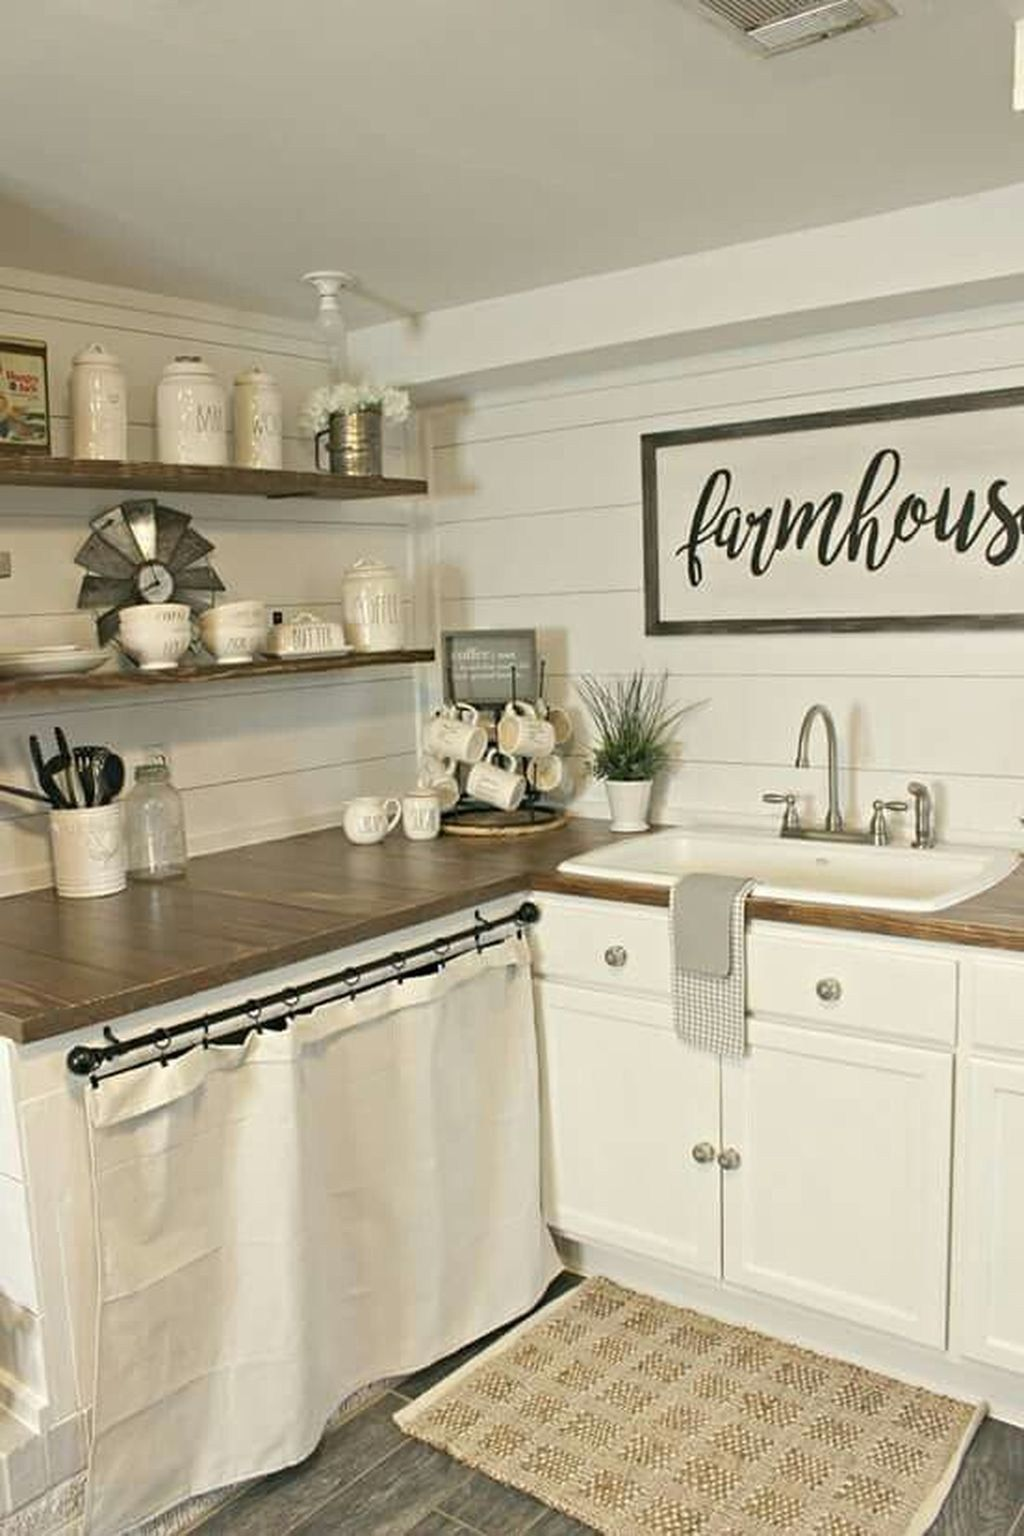 Stunning Small Farmhouse Kitchen Decor Ideas Best For Your ... on Rustic:yucvisfte_S= Farmhouse Kitchen Ideas  id=27752